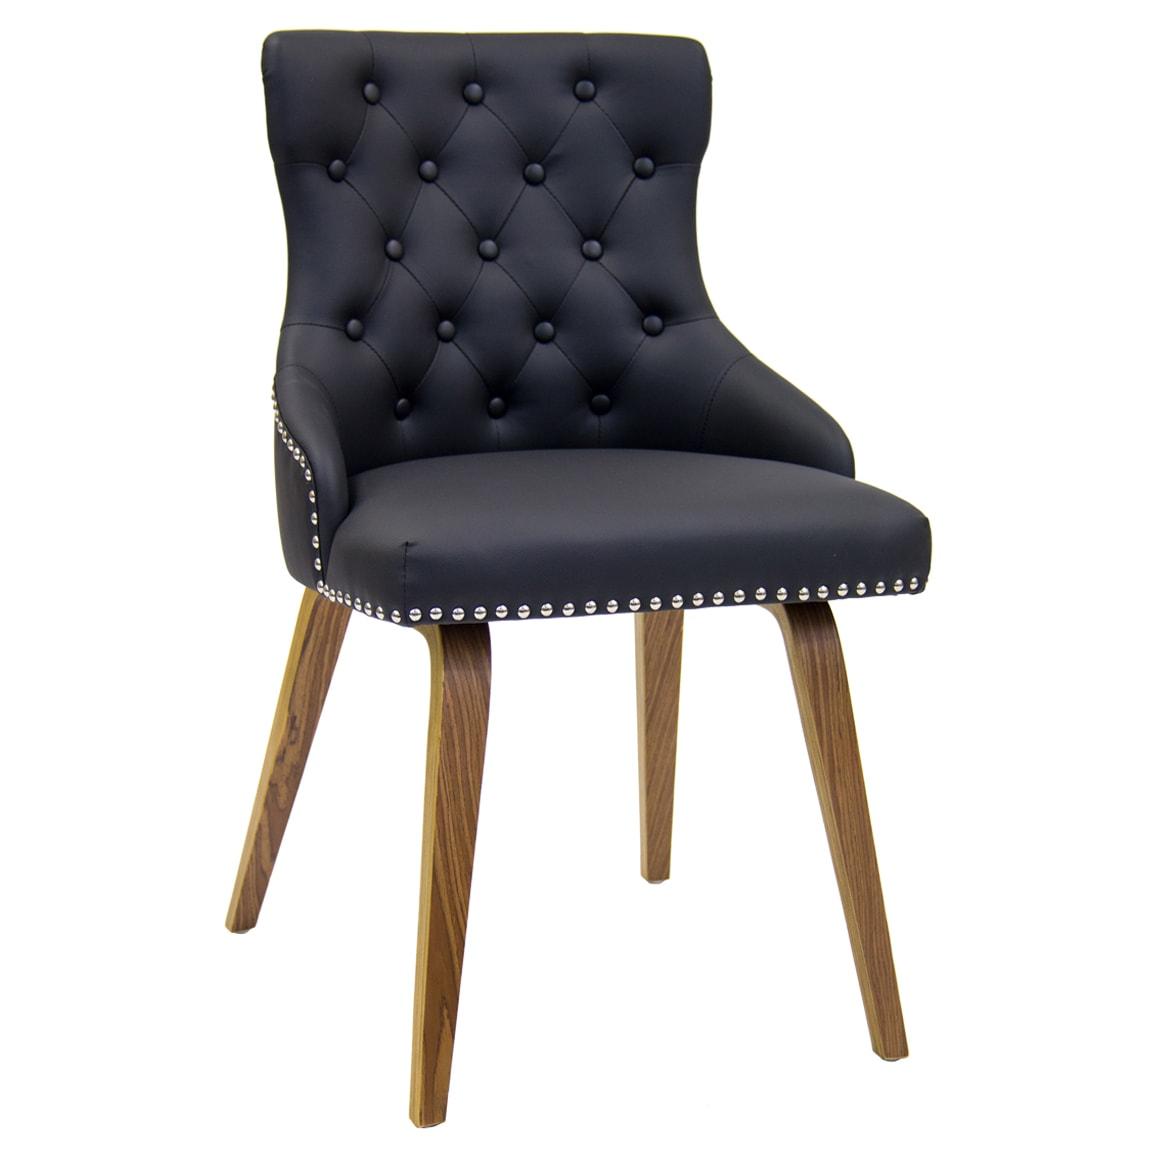 Monarch Wood Chair